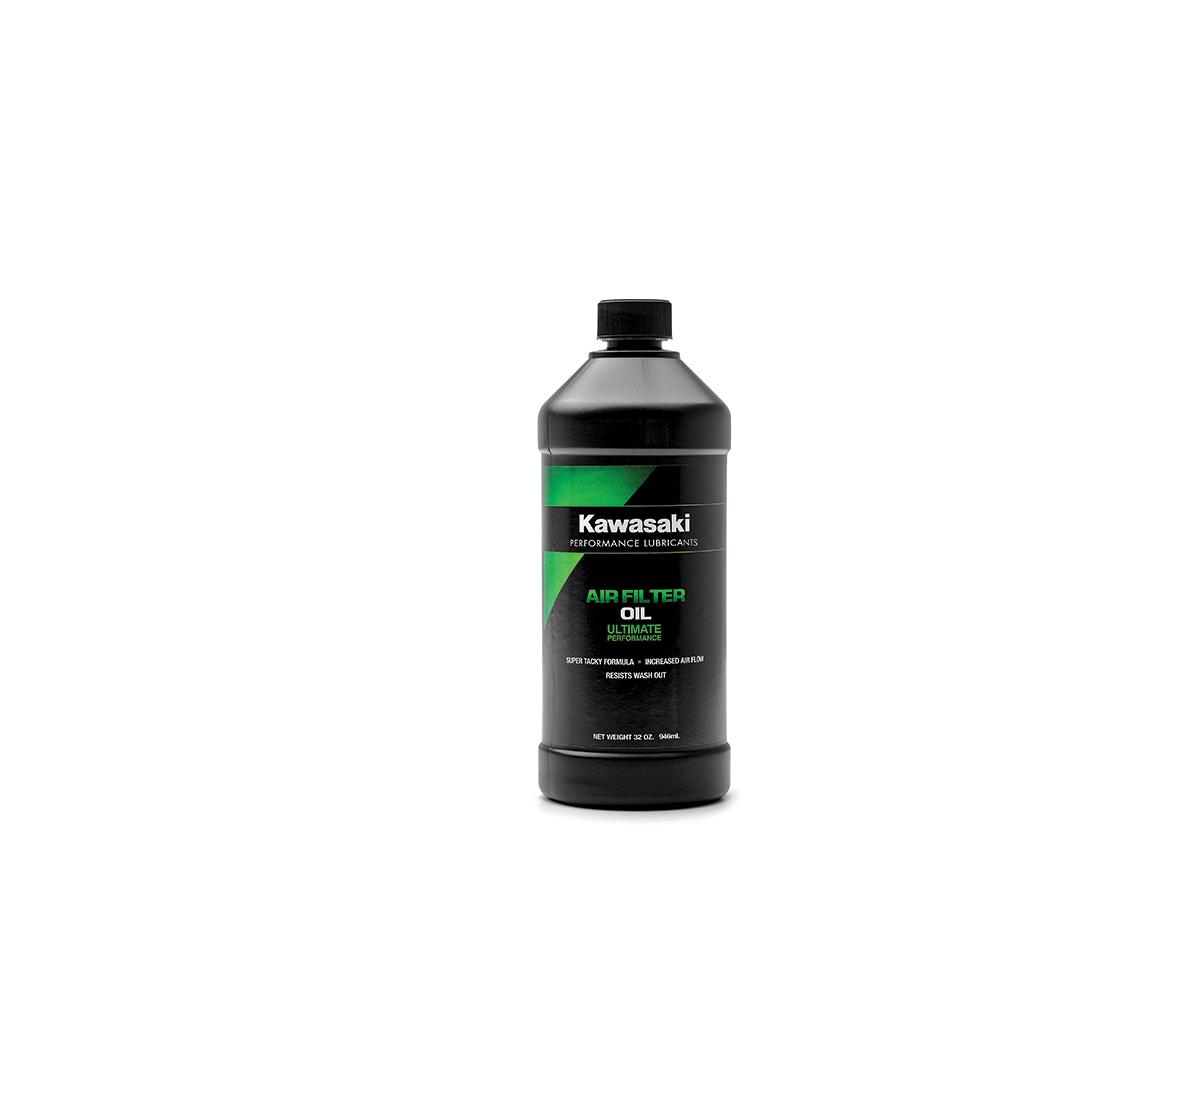 Kawasaki Performance Air Filter Oil